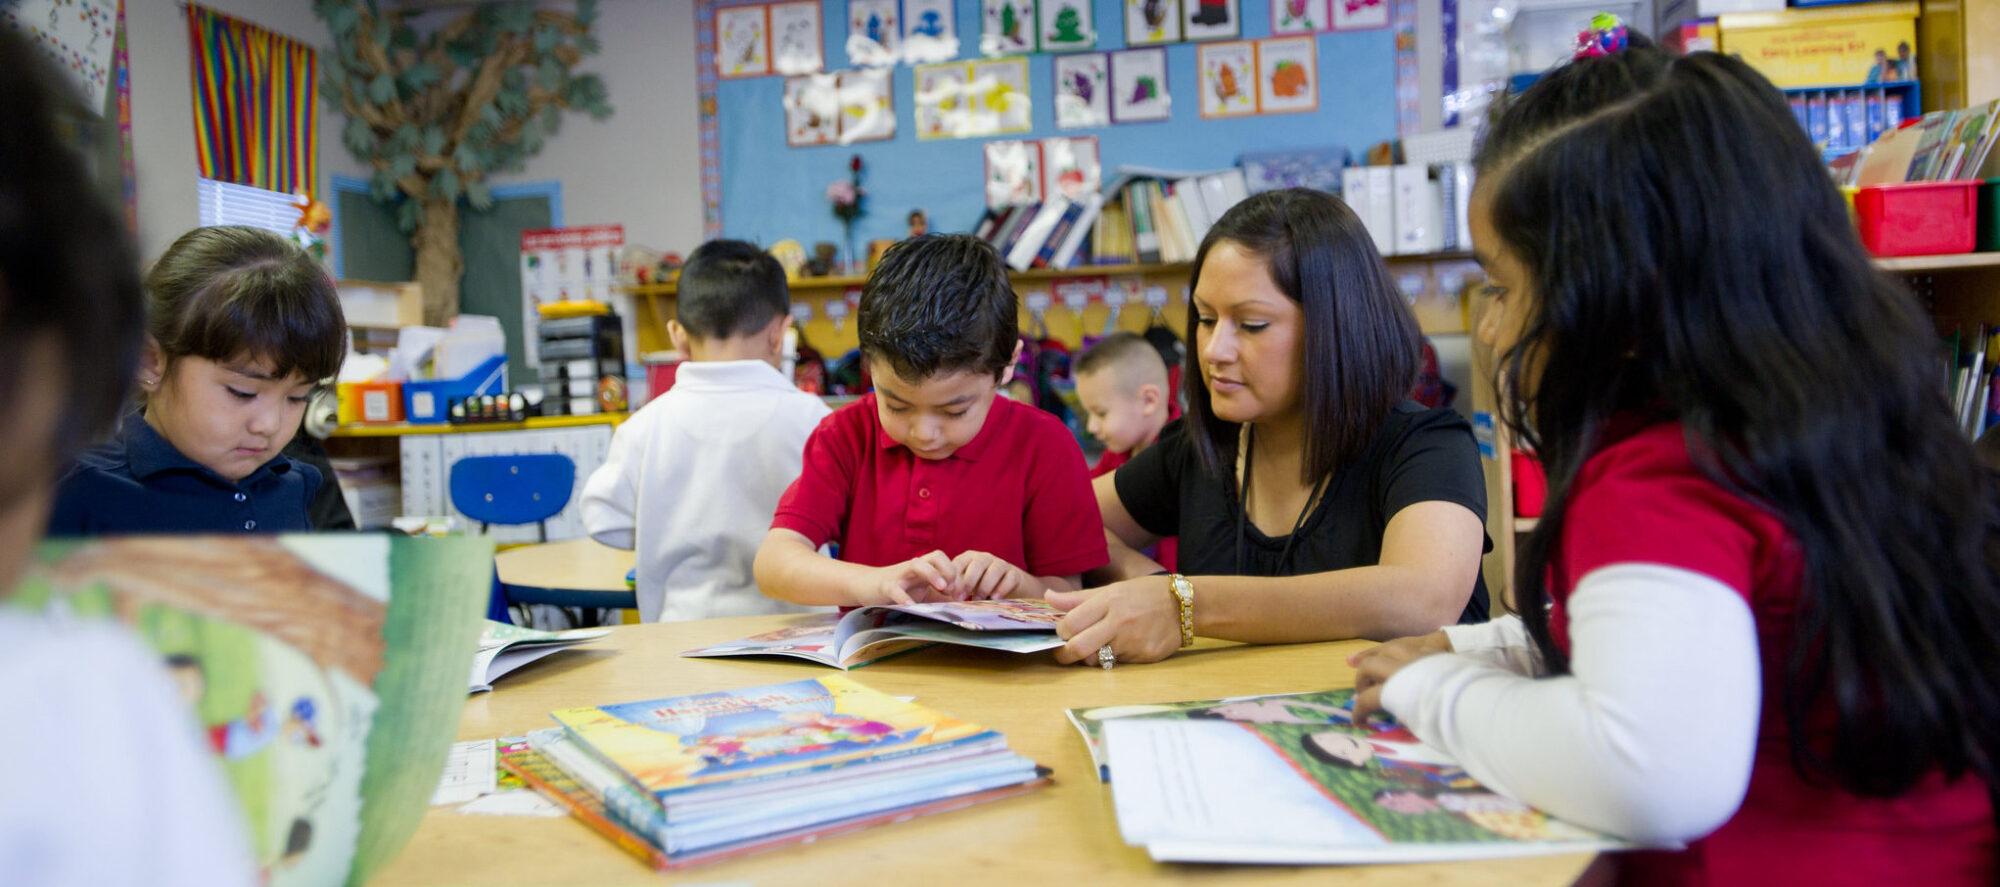 hispanic female teacher help young hispanic boy in classroom.